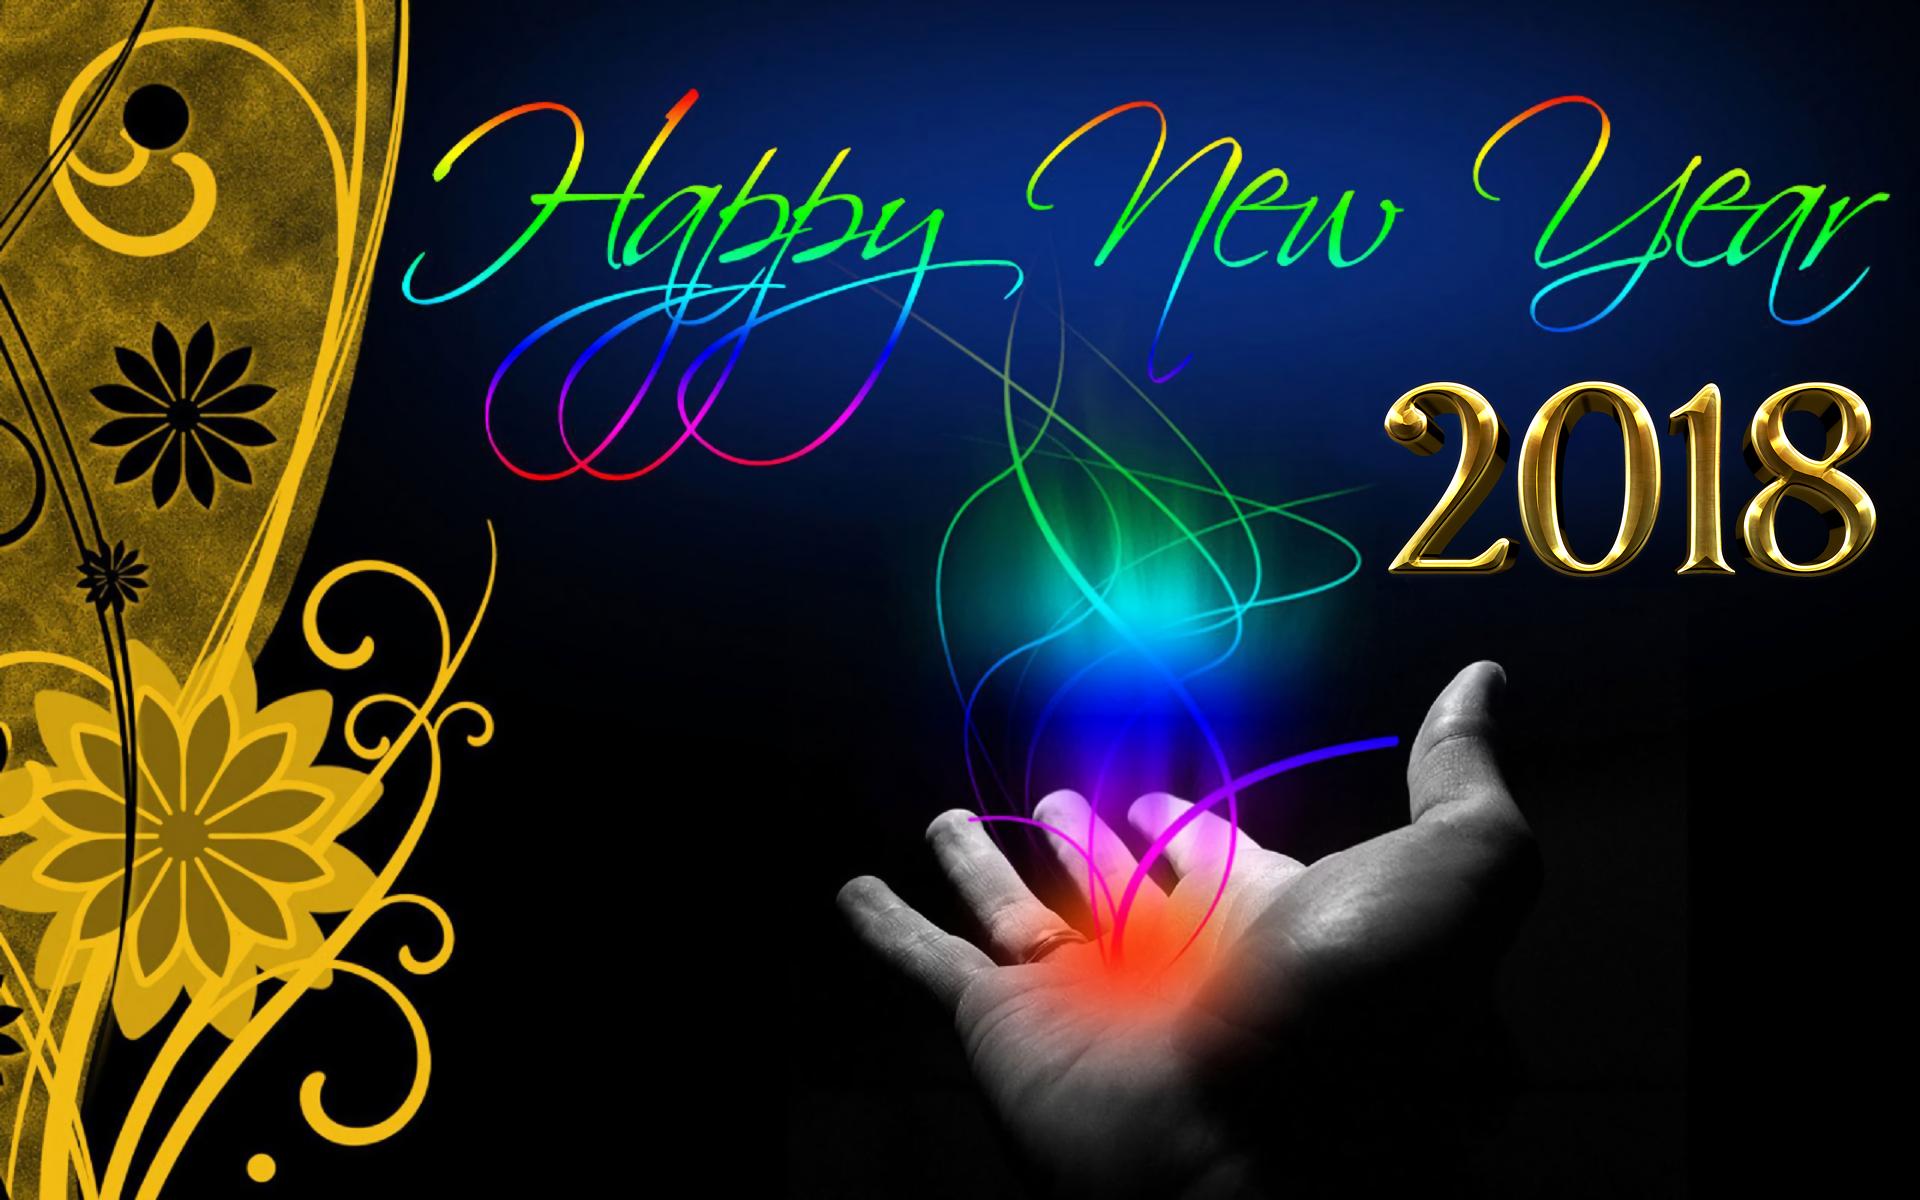 Magical Happy New Year - HD Wallpaper